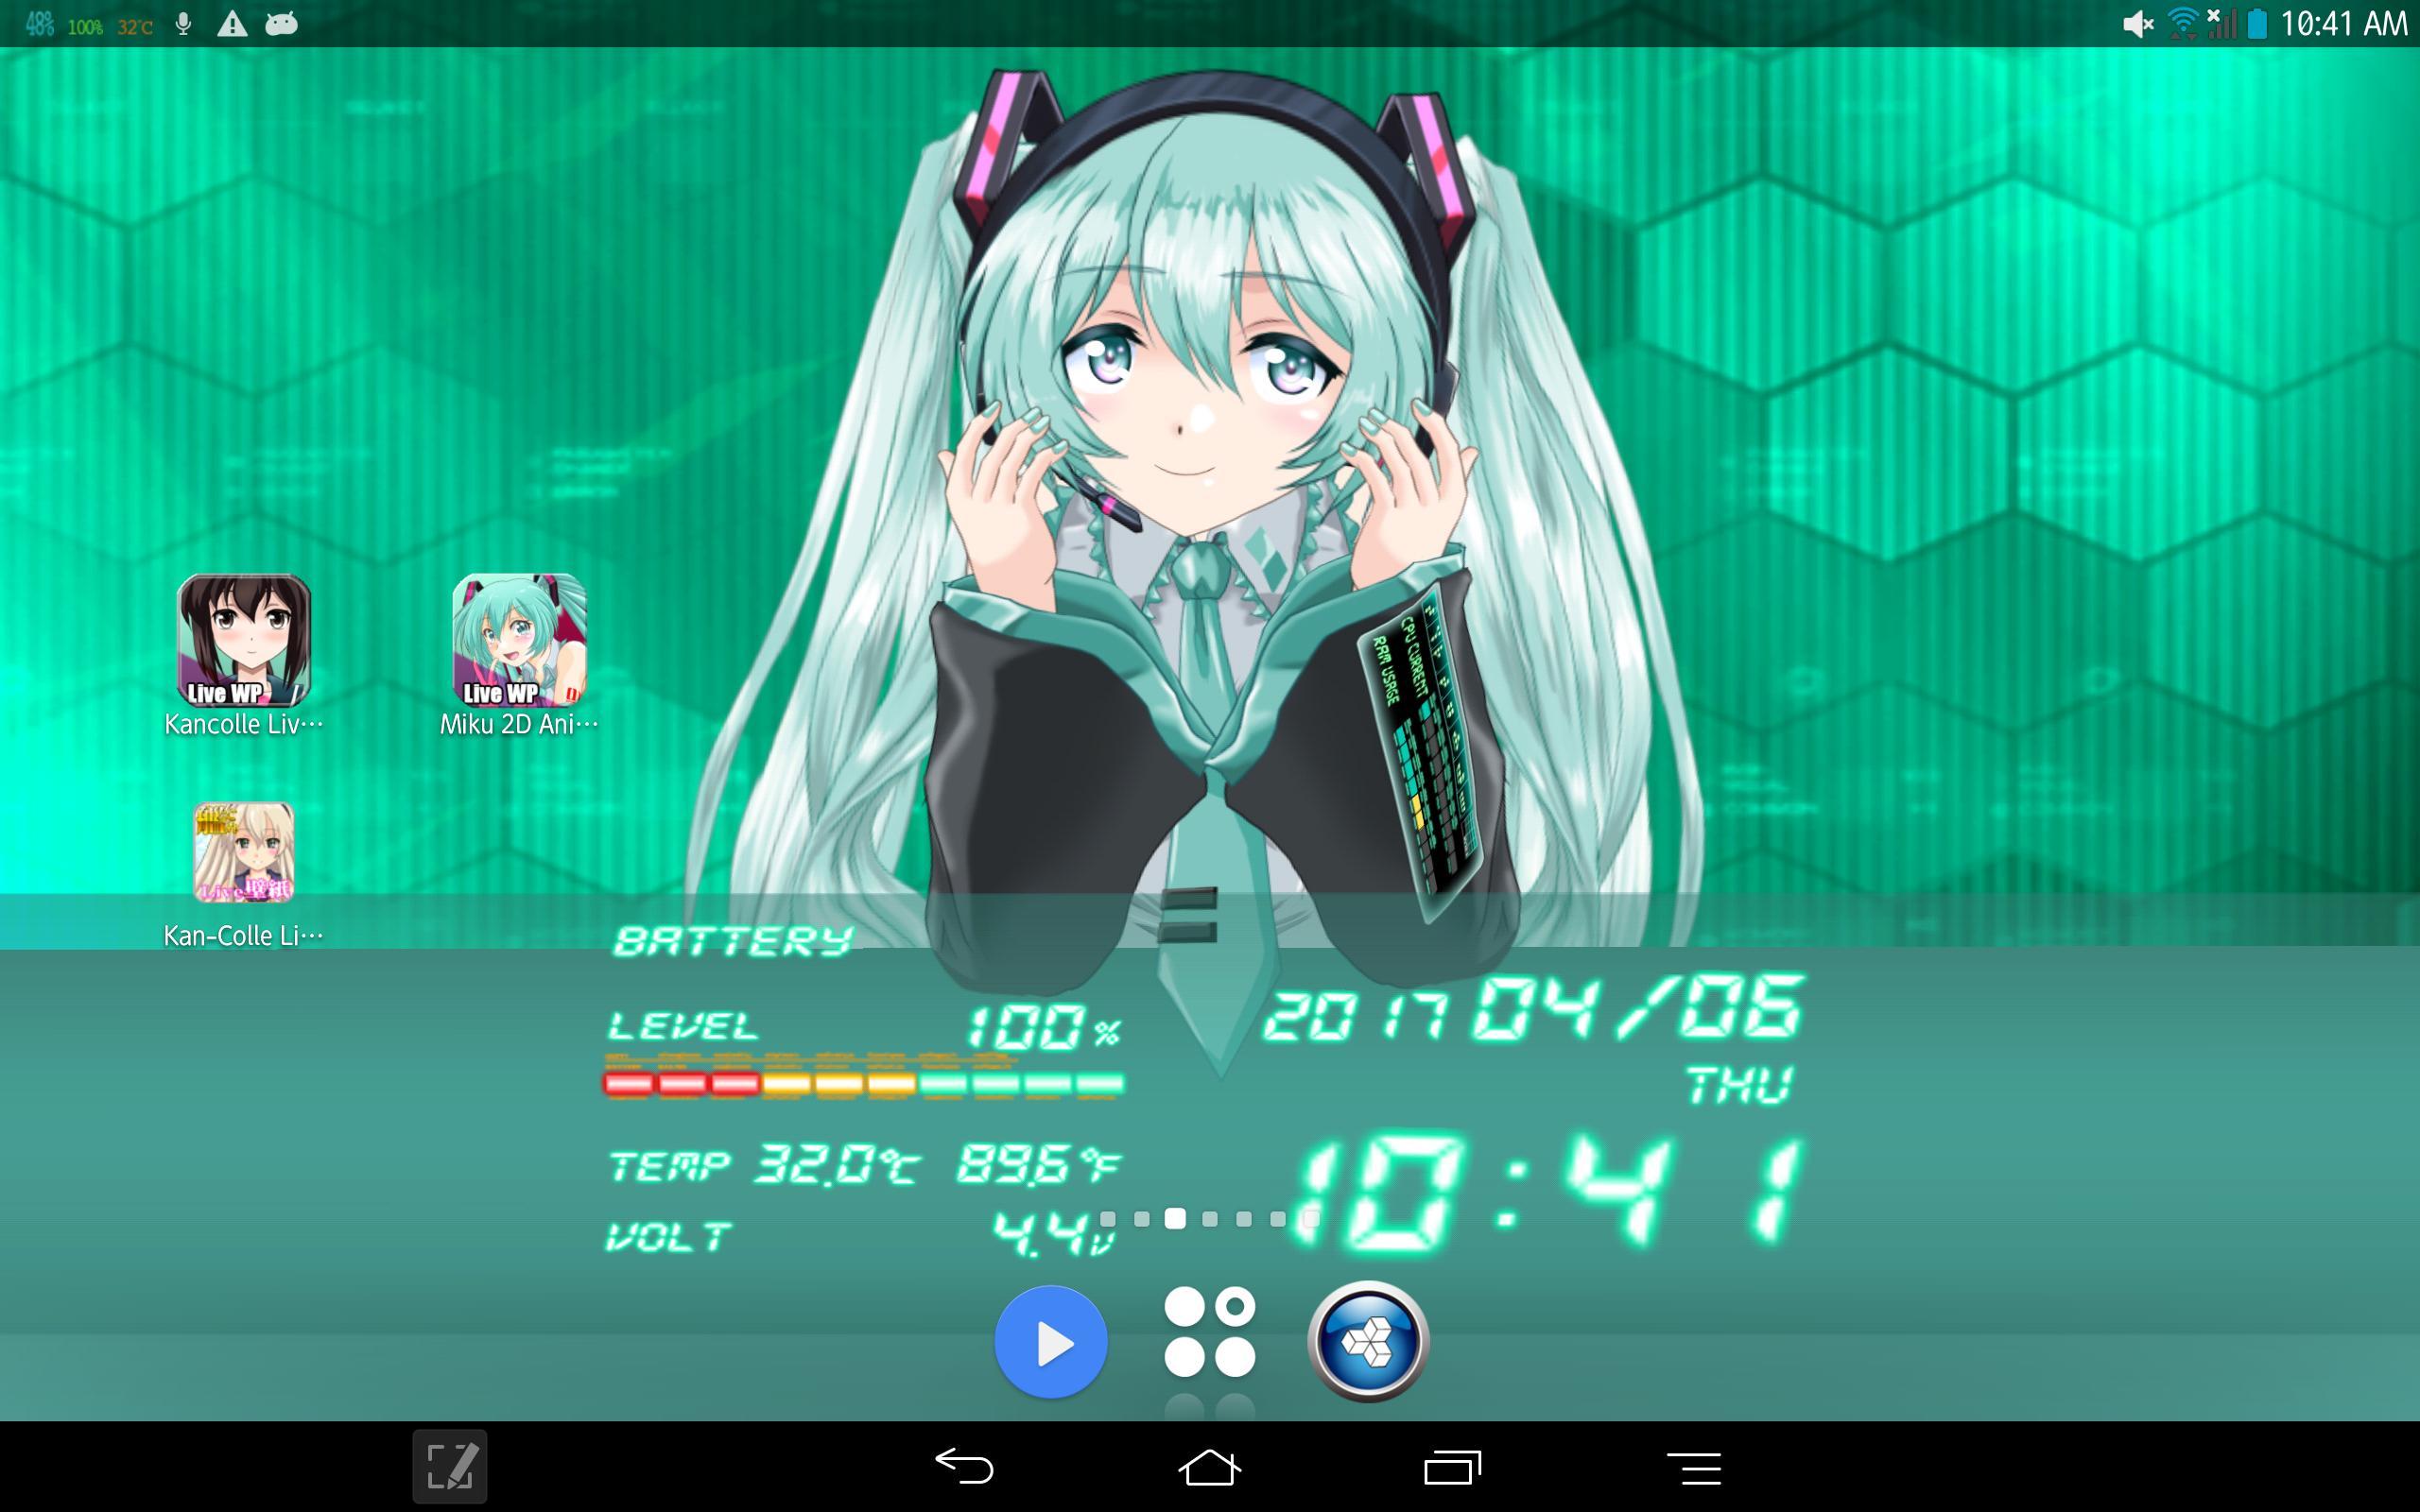 17+ Download Miku 2d Anime Live Wallpaper - Michi Wallpaper